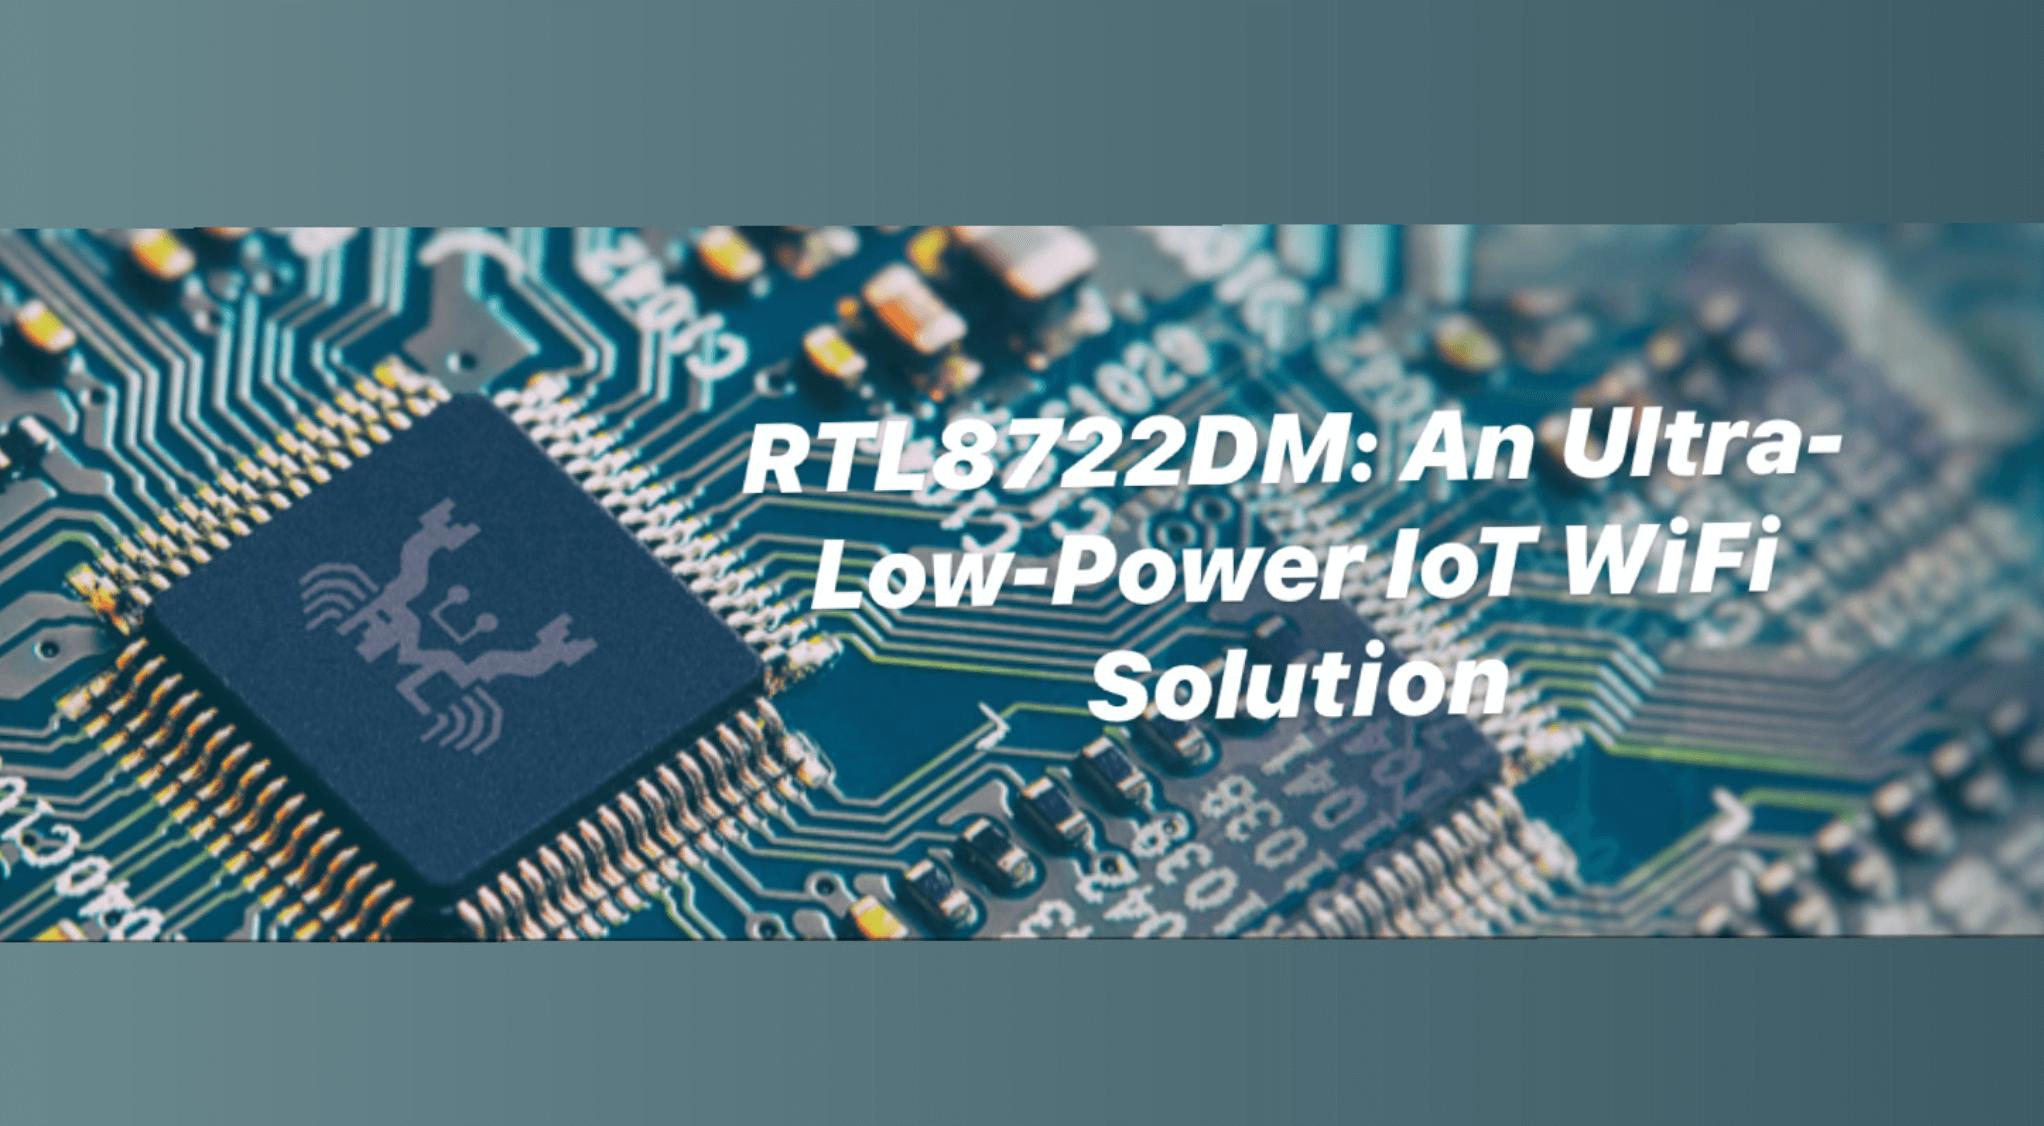 RTL8722DM: An Ultra-Low-Power IoT WiFi Solution